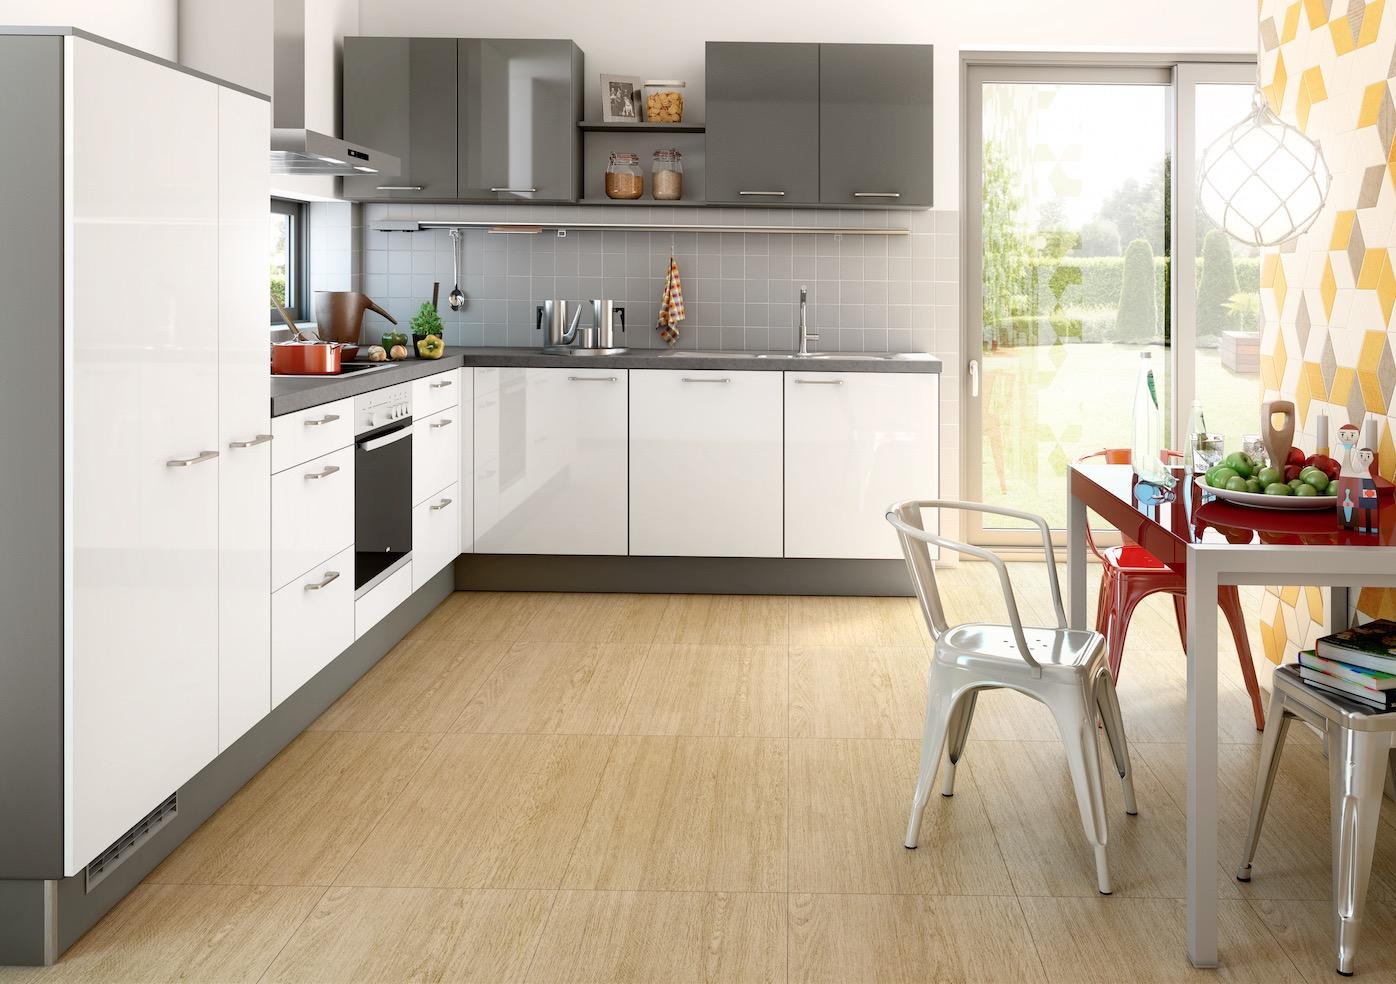 madeia wesfa sch ller k chen luxusk che online nolte. Black Bedroom Furniture Sets. Home Design Ideas